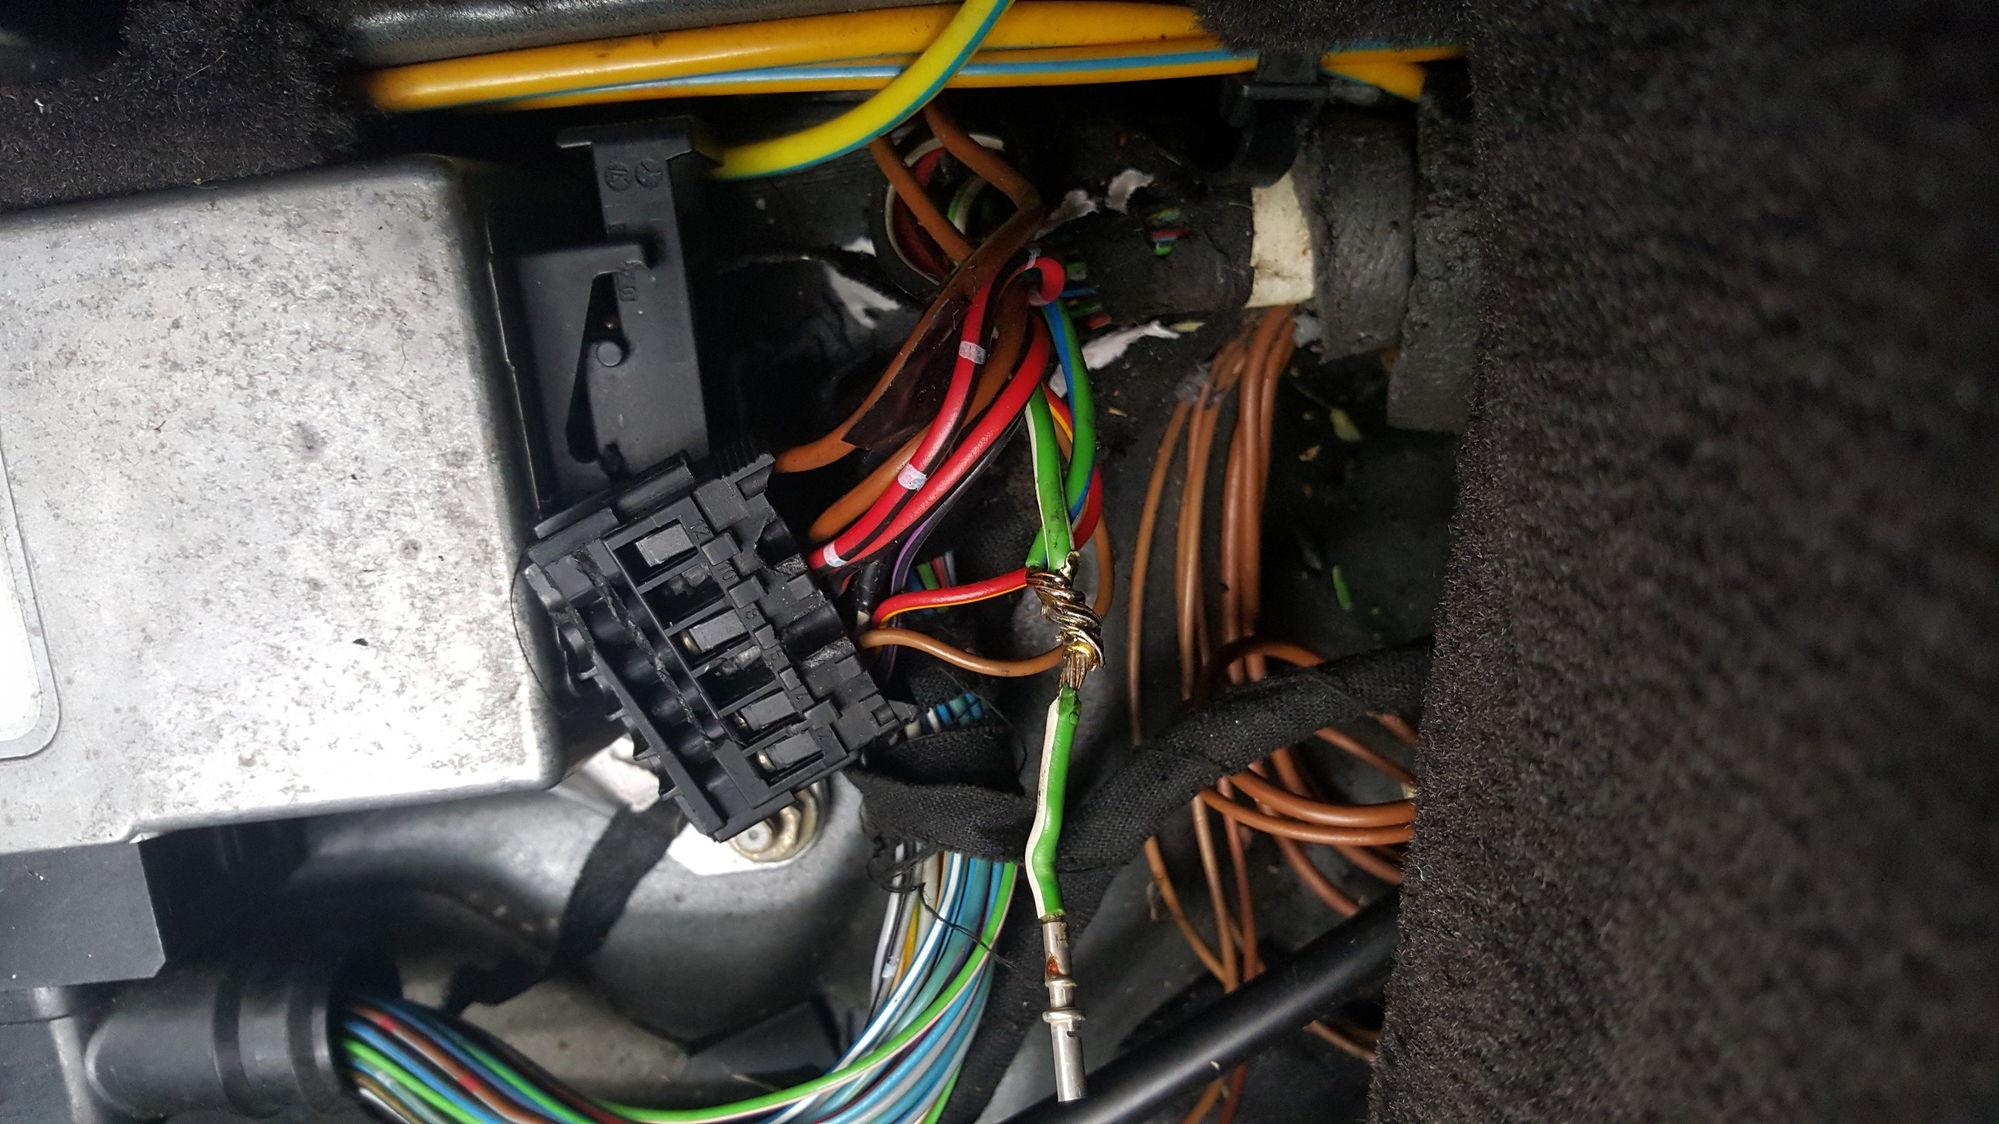 E300td Wiring Diagram : Sl soft top controller wiring mbworld forums